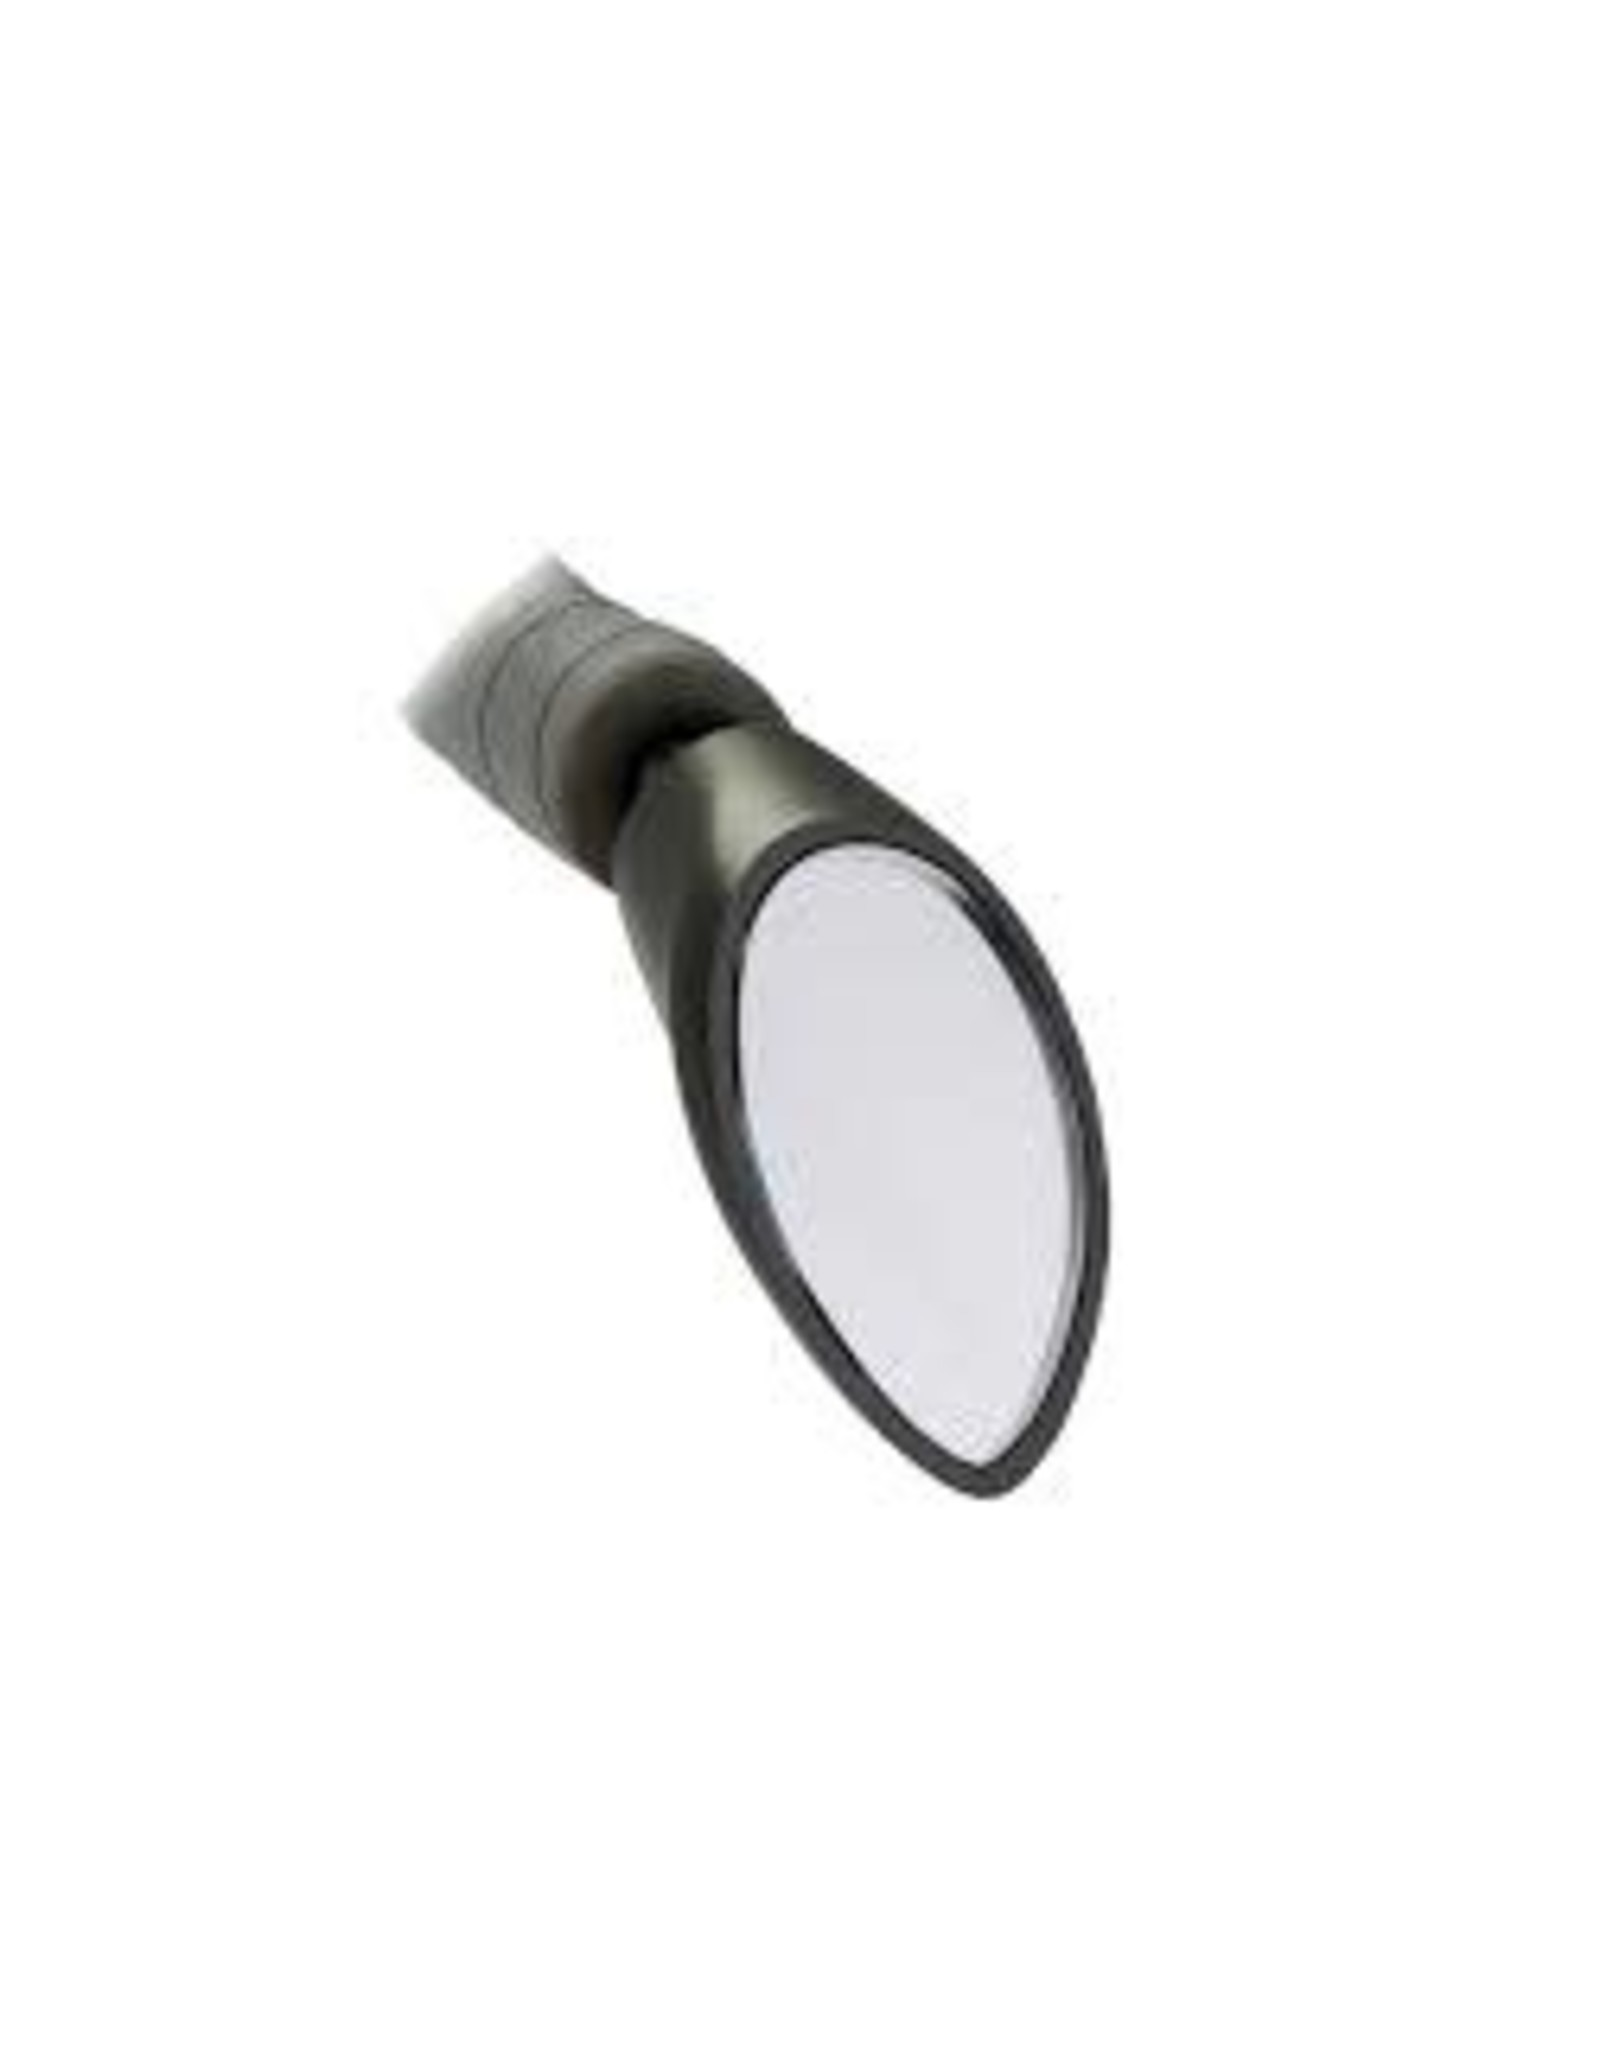 CycleAware Mirror CycleAware Roadie Removable Bar-end : Black